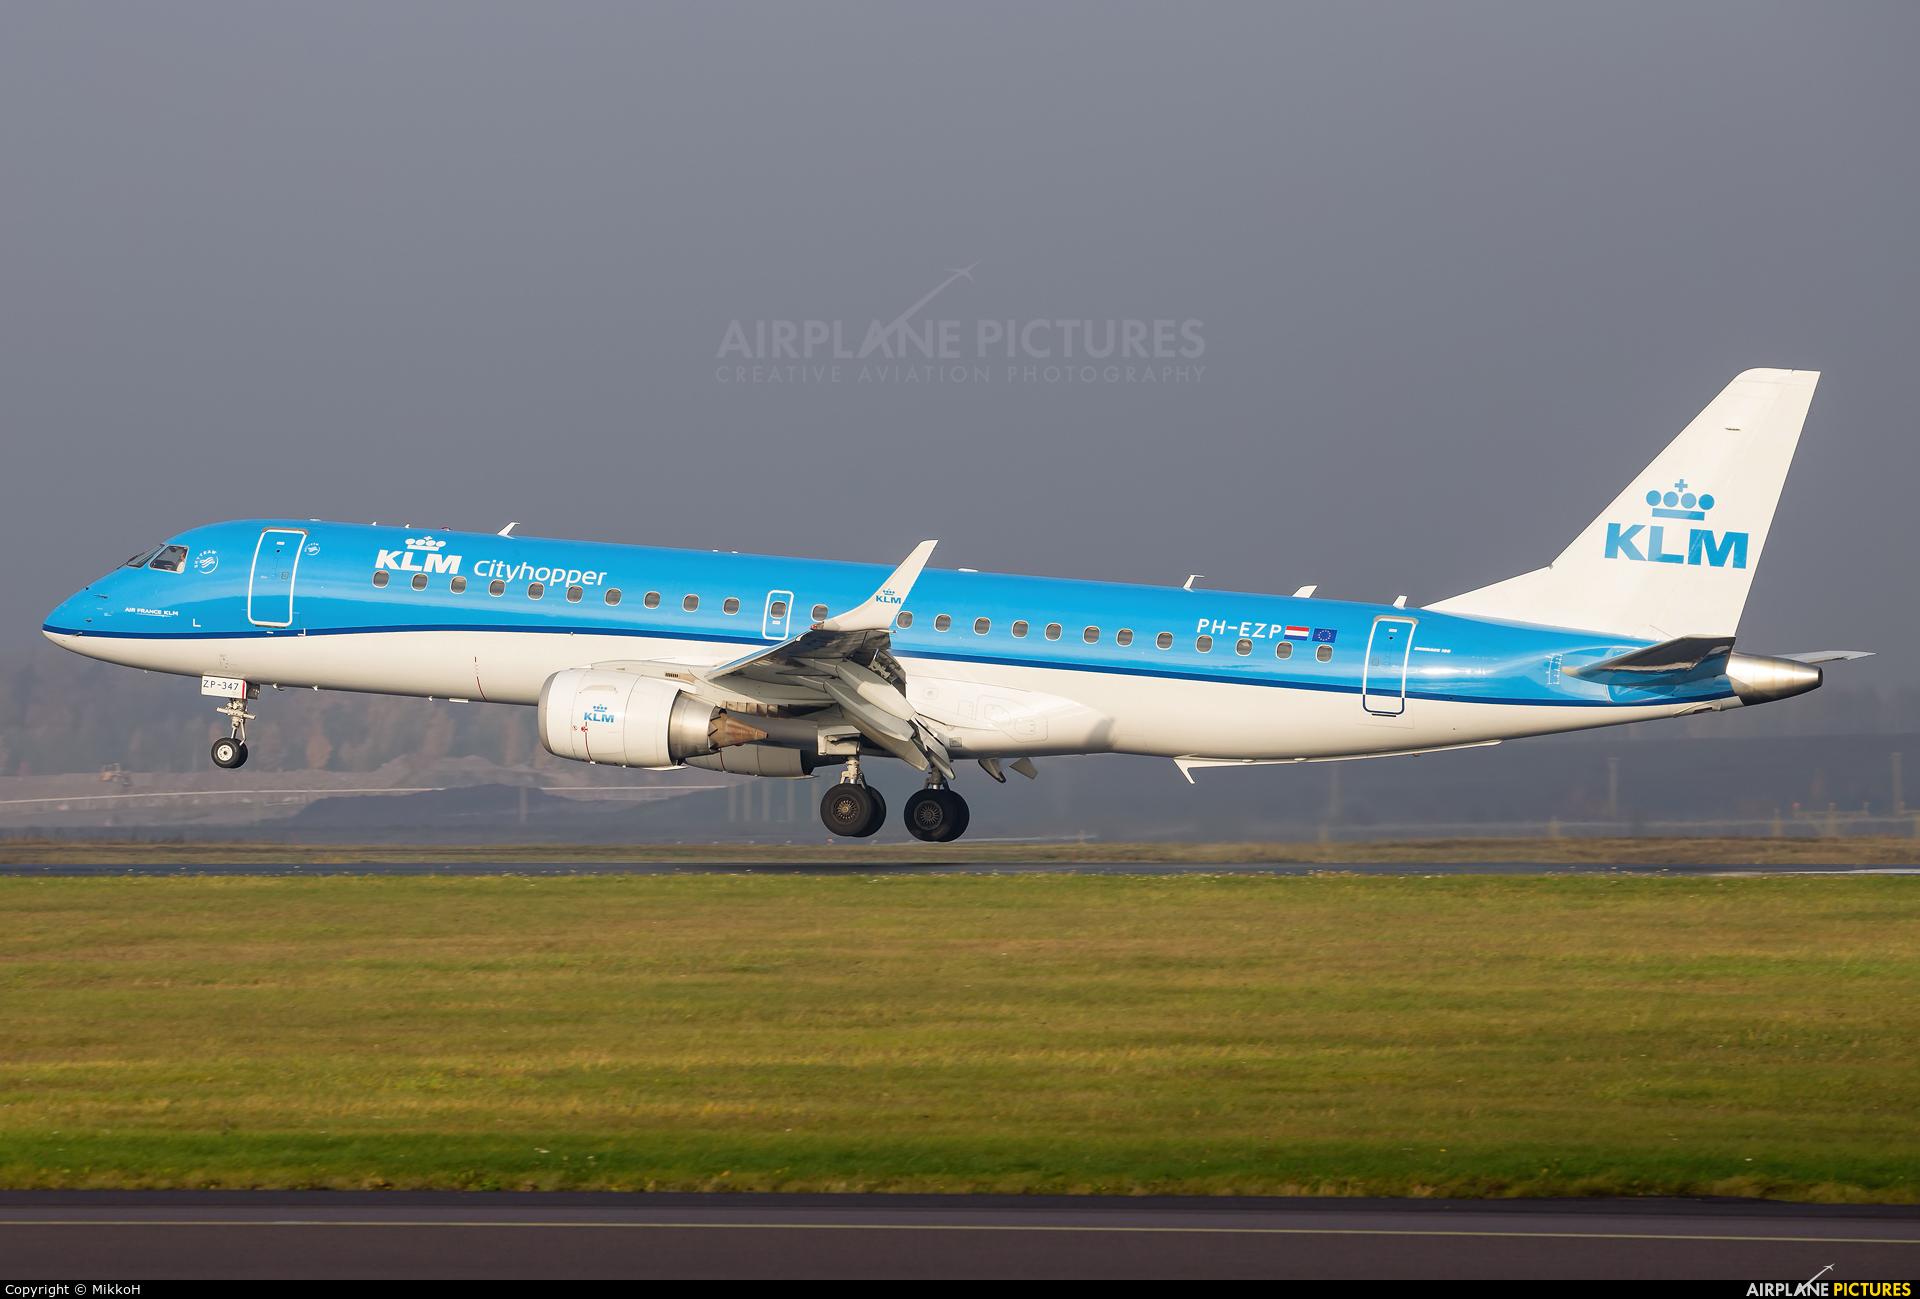 KLM Cityhopper PH-EZP aircraft at Helsinki - Vantaa